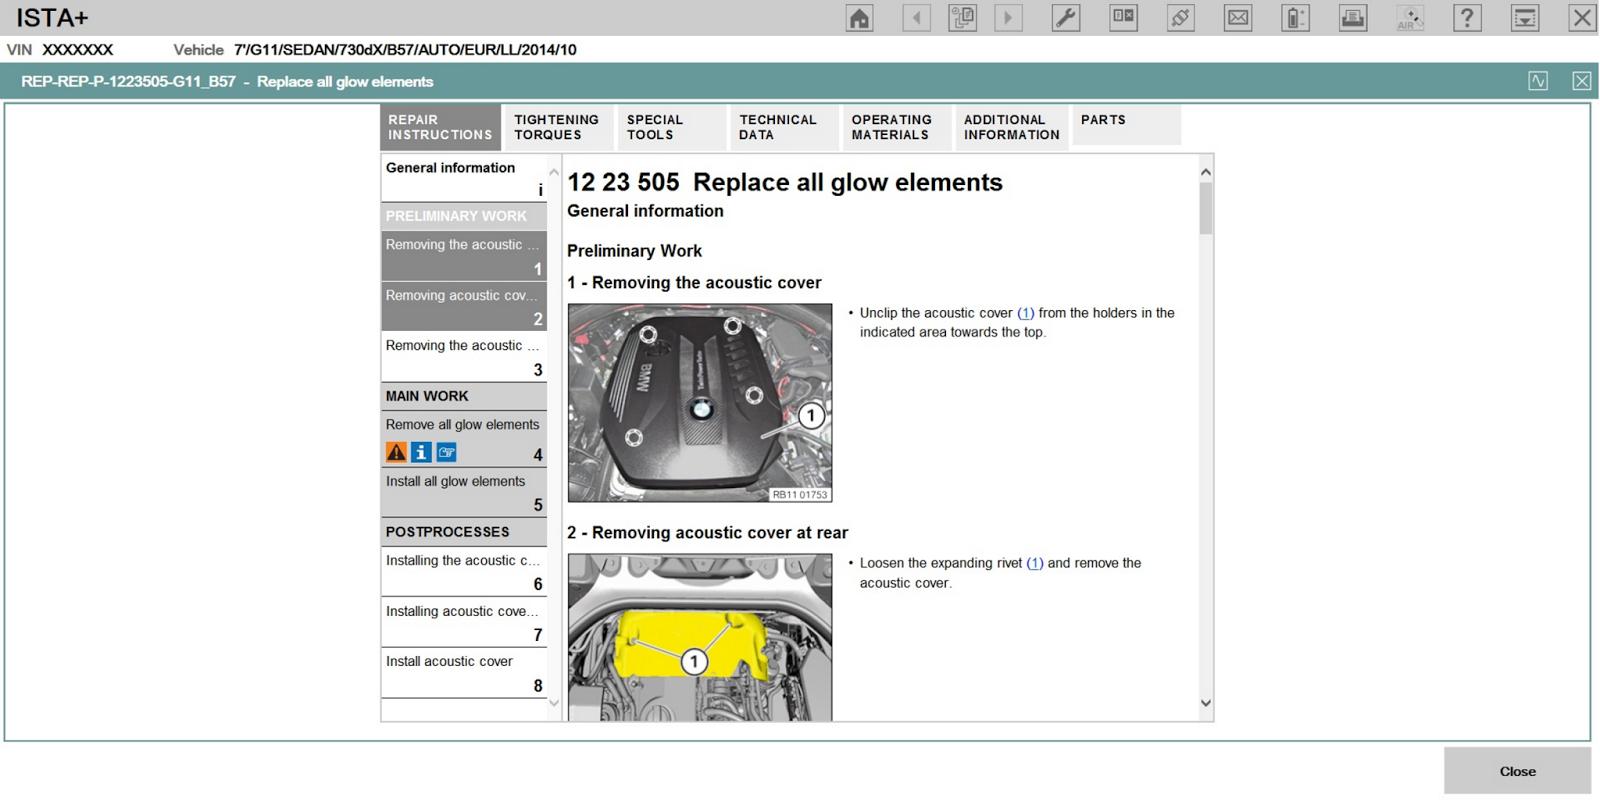 New Ediabas Inpa Software Download